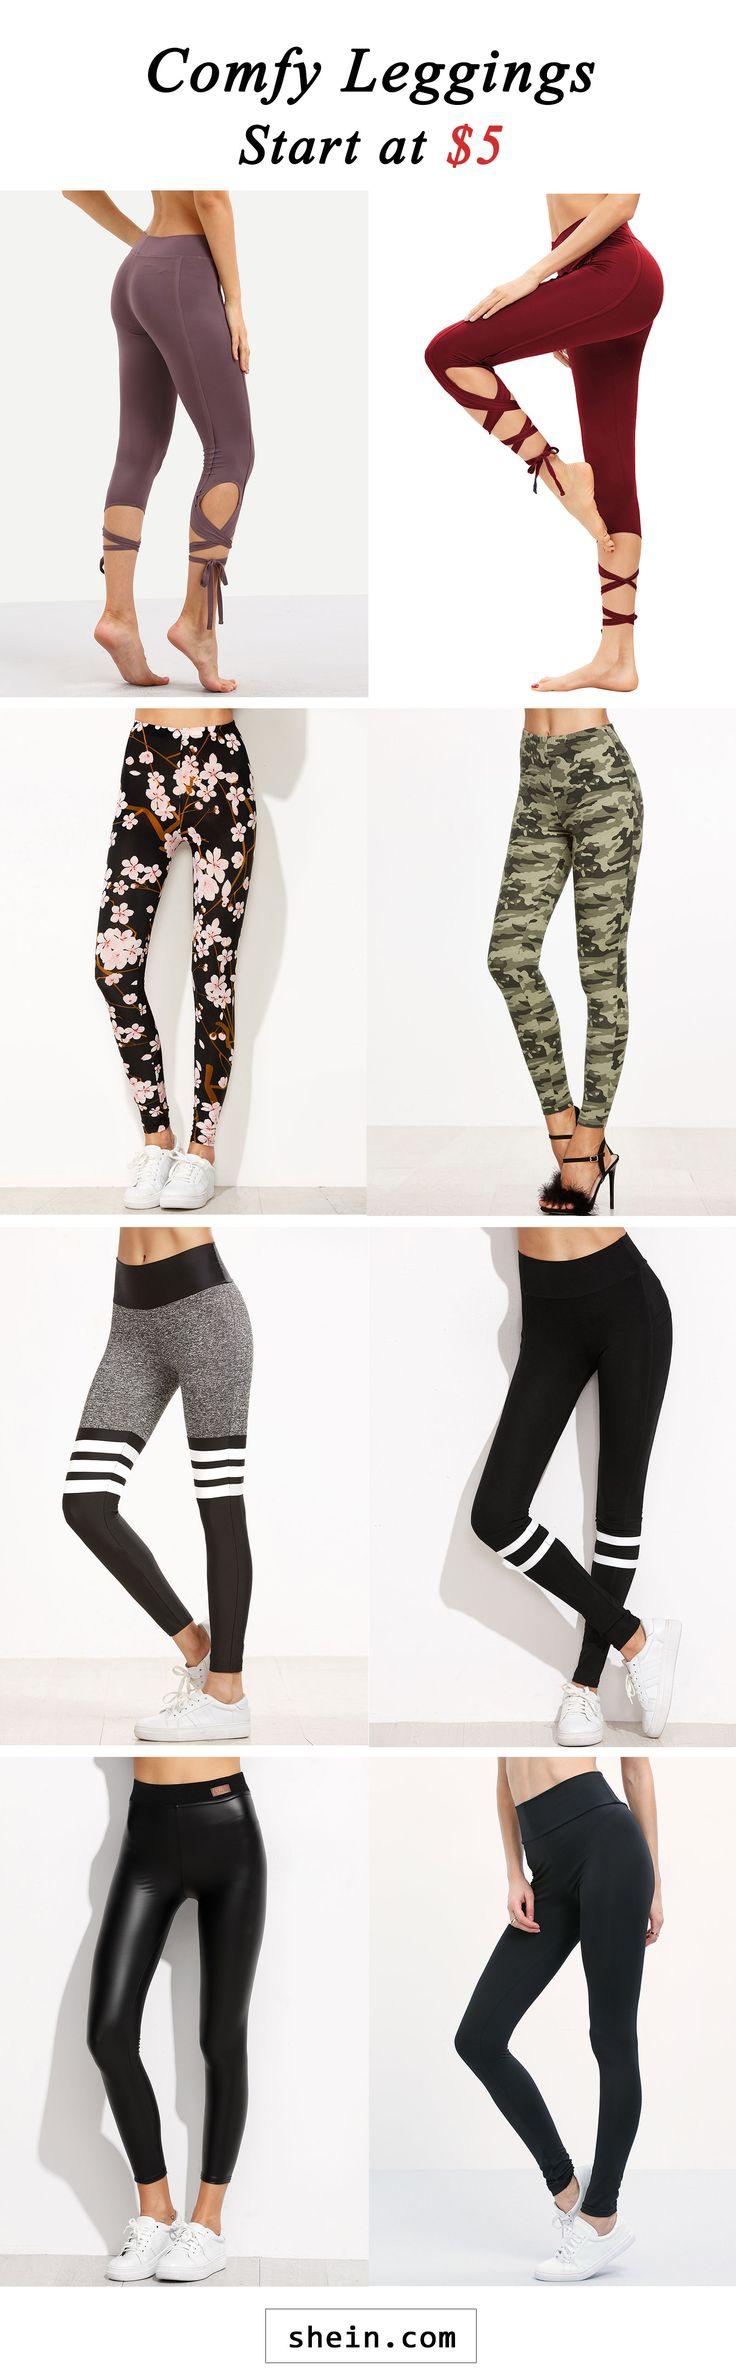 Comfy leggings start at $5